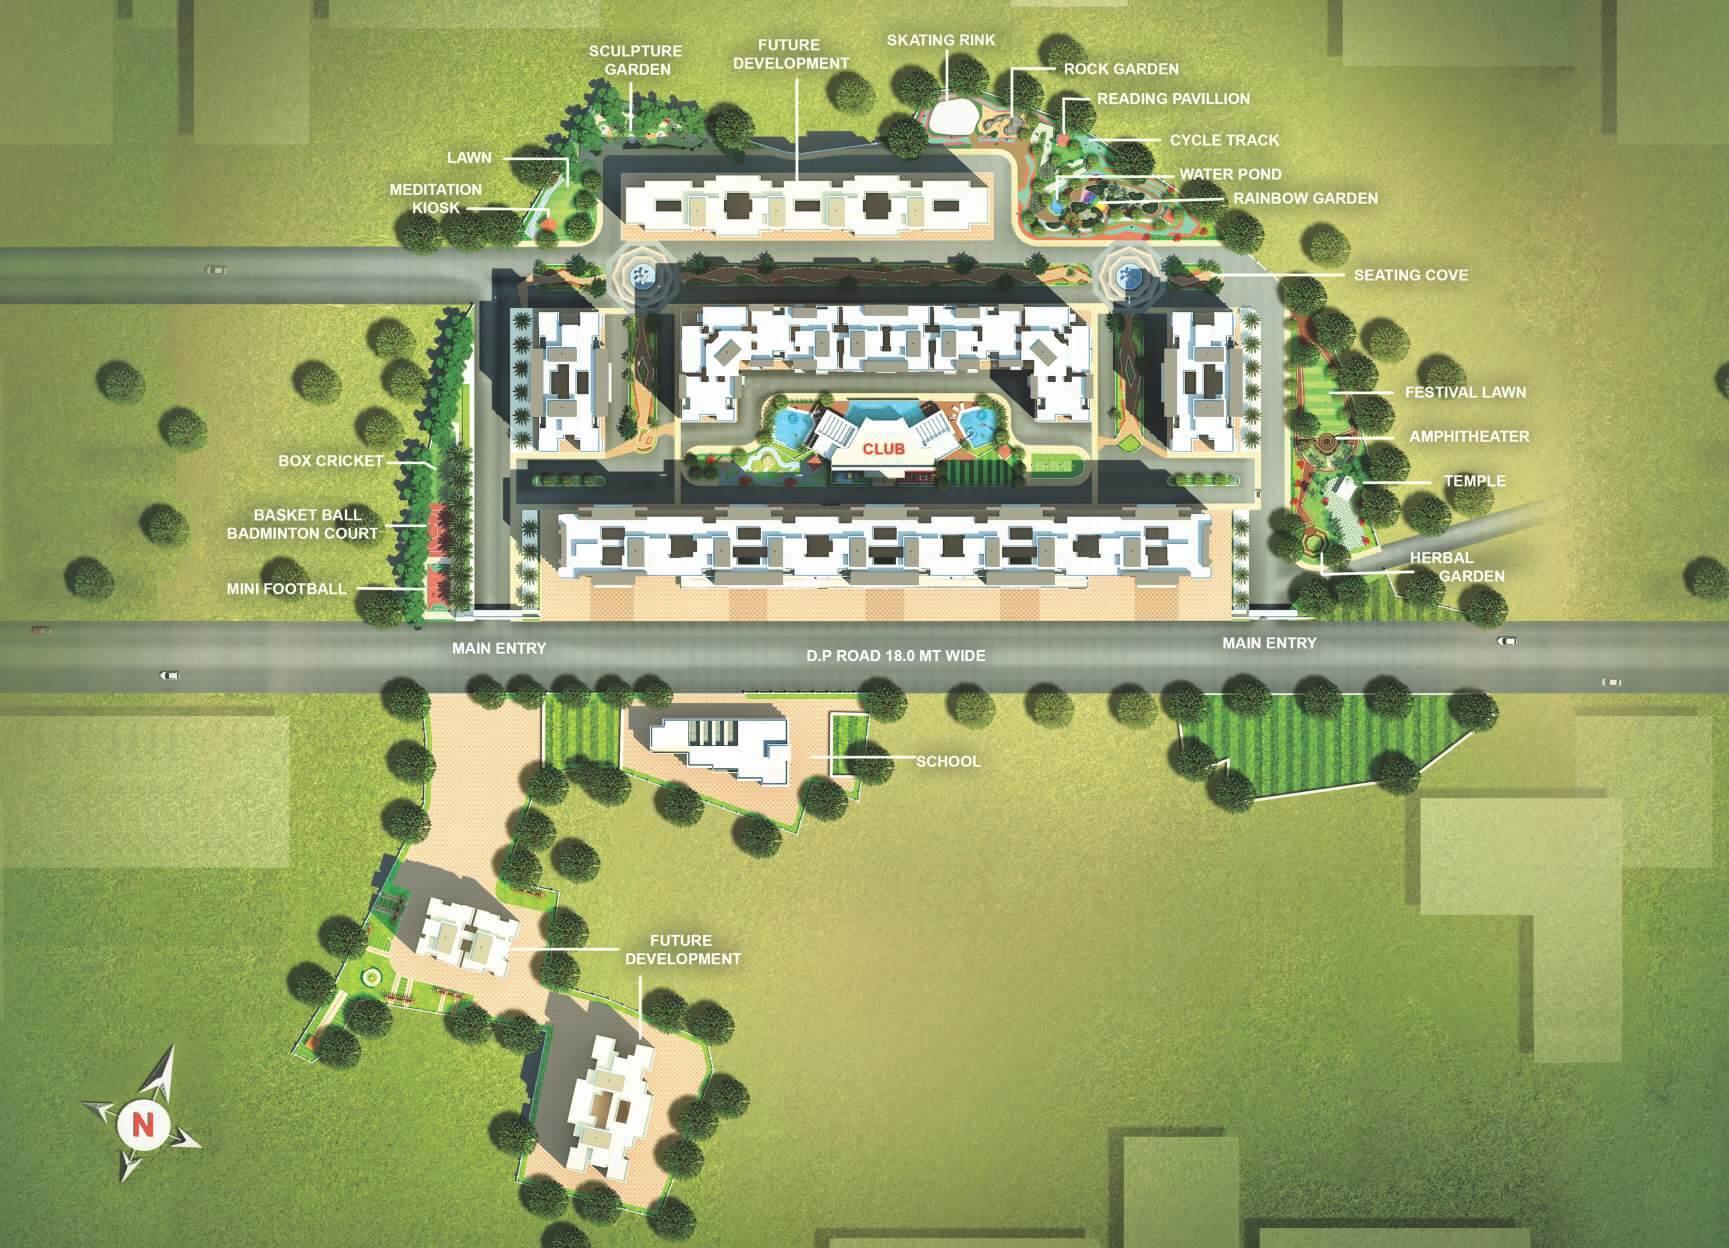 master-plan-image-Picture-mohan-nano-estates-2545251